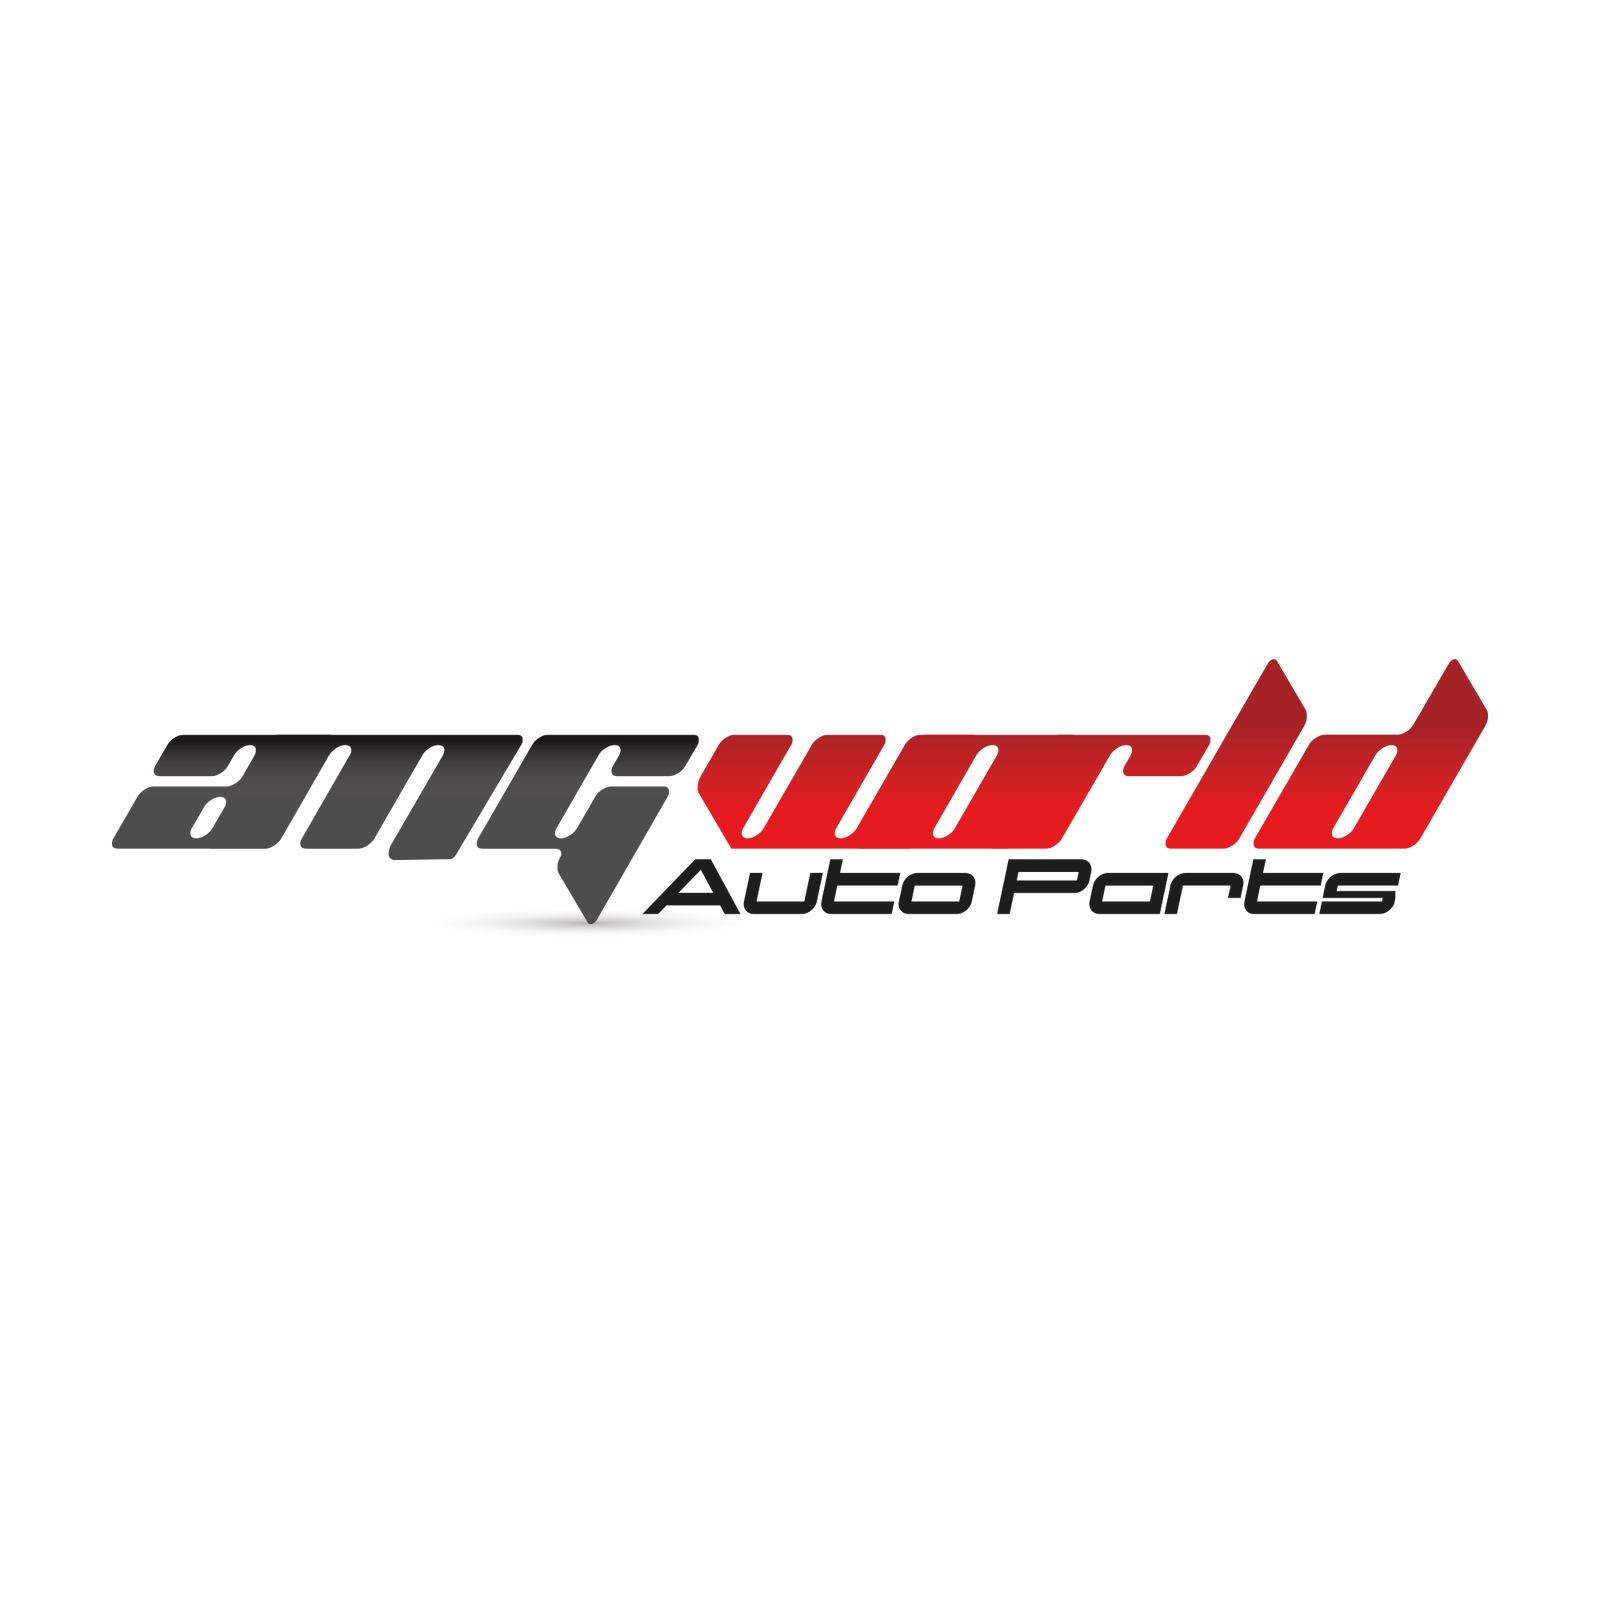 AMG World AutoParts